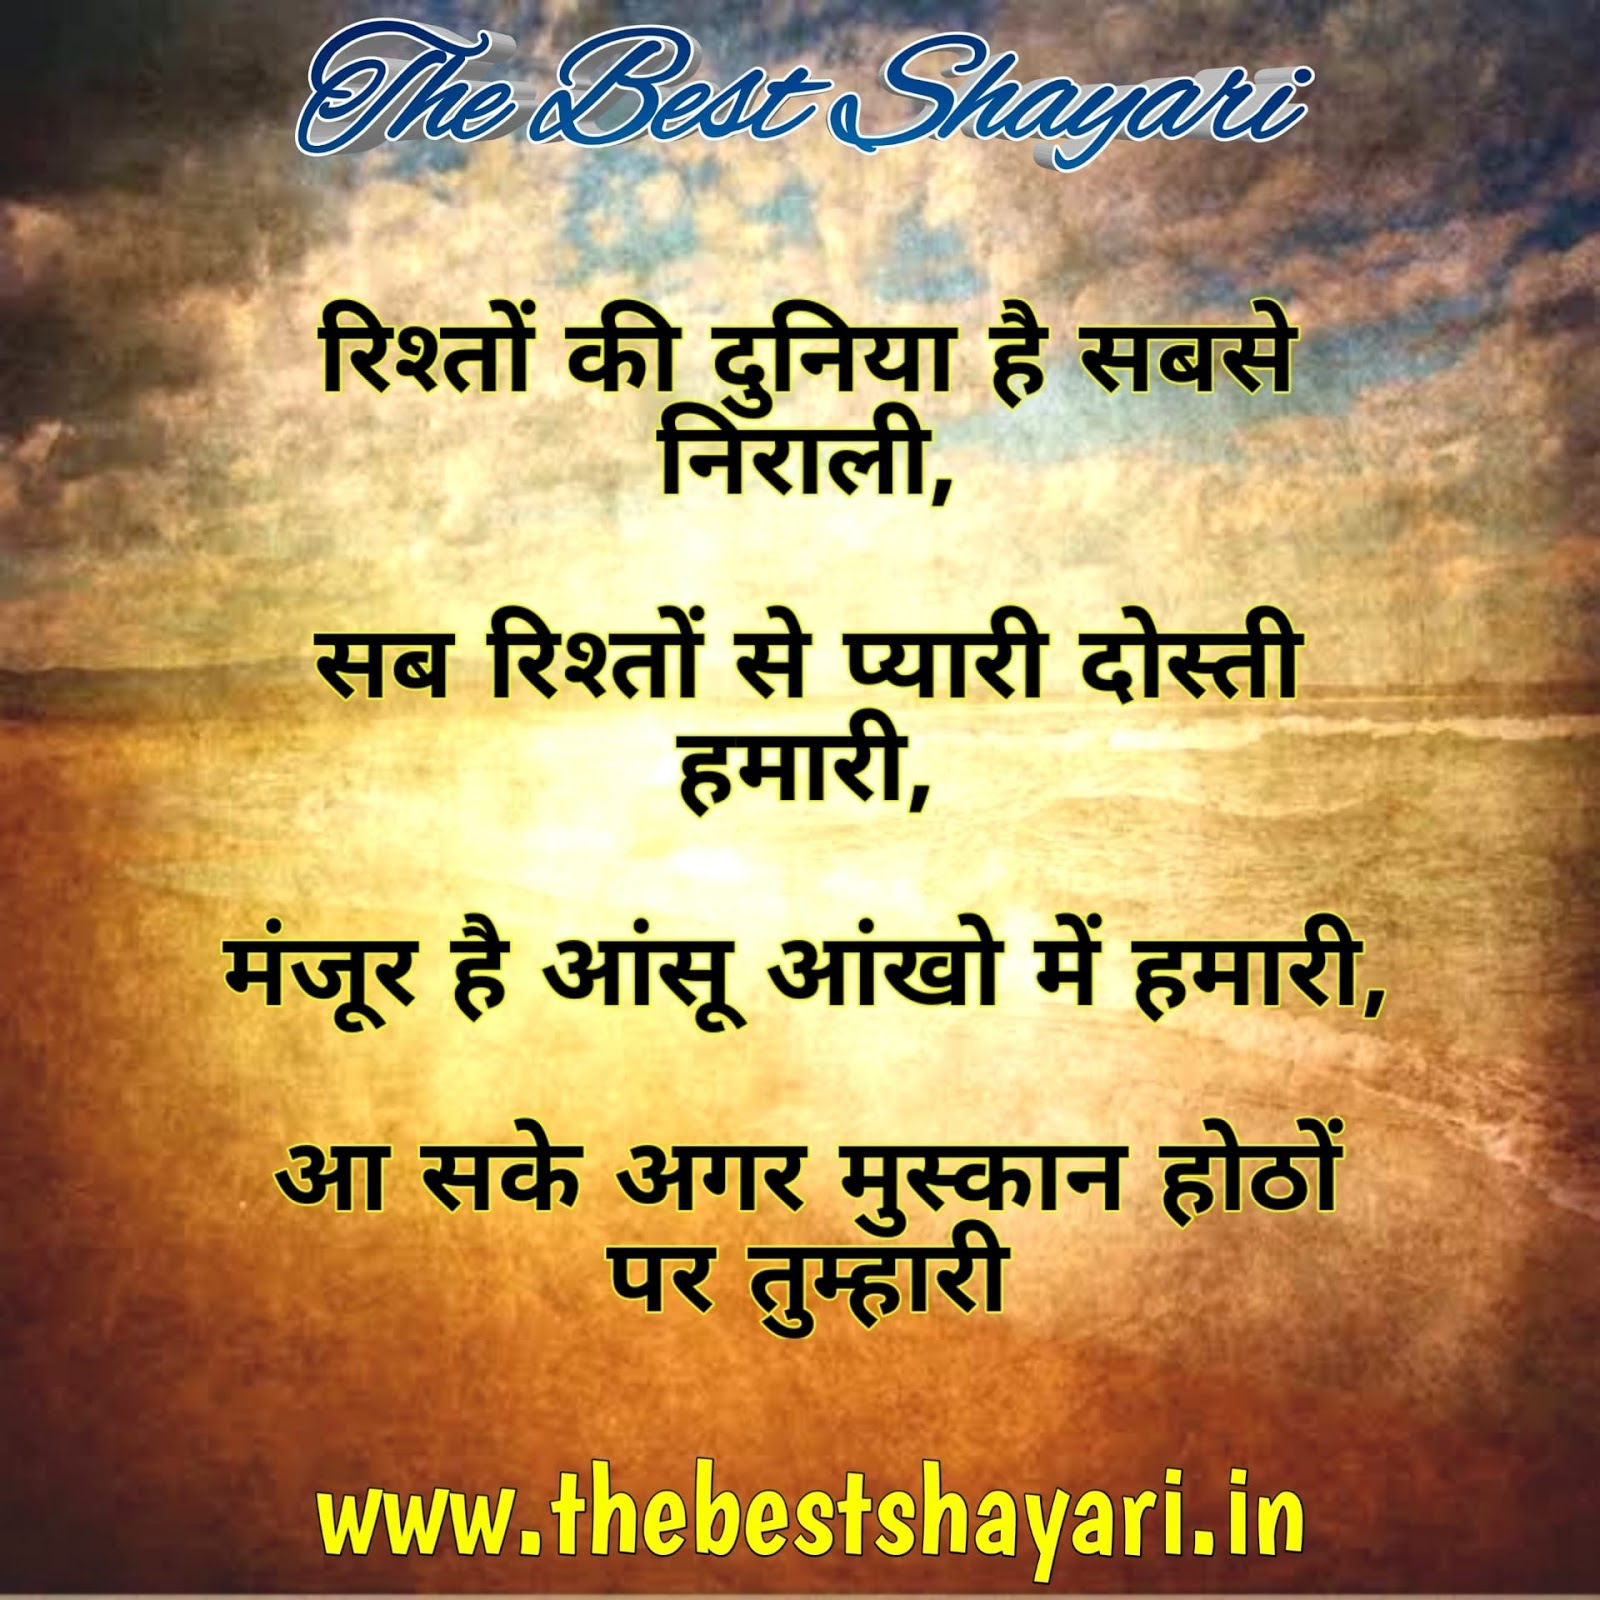 Latest Friendship Shayari In Hindi 2019